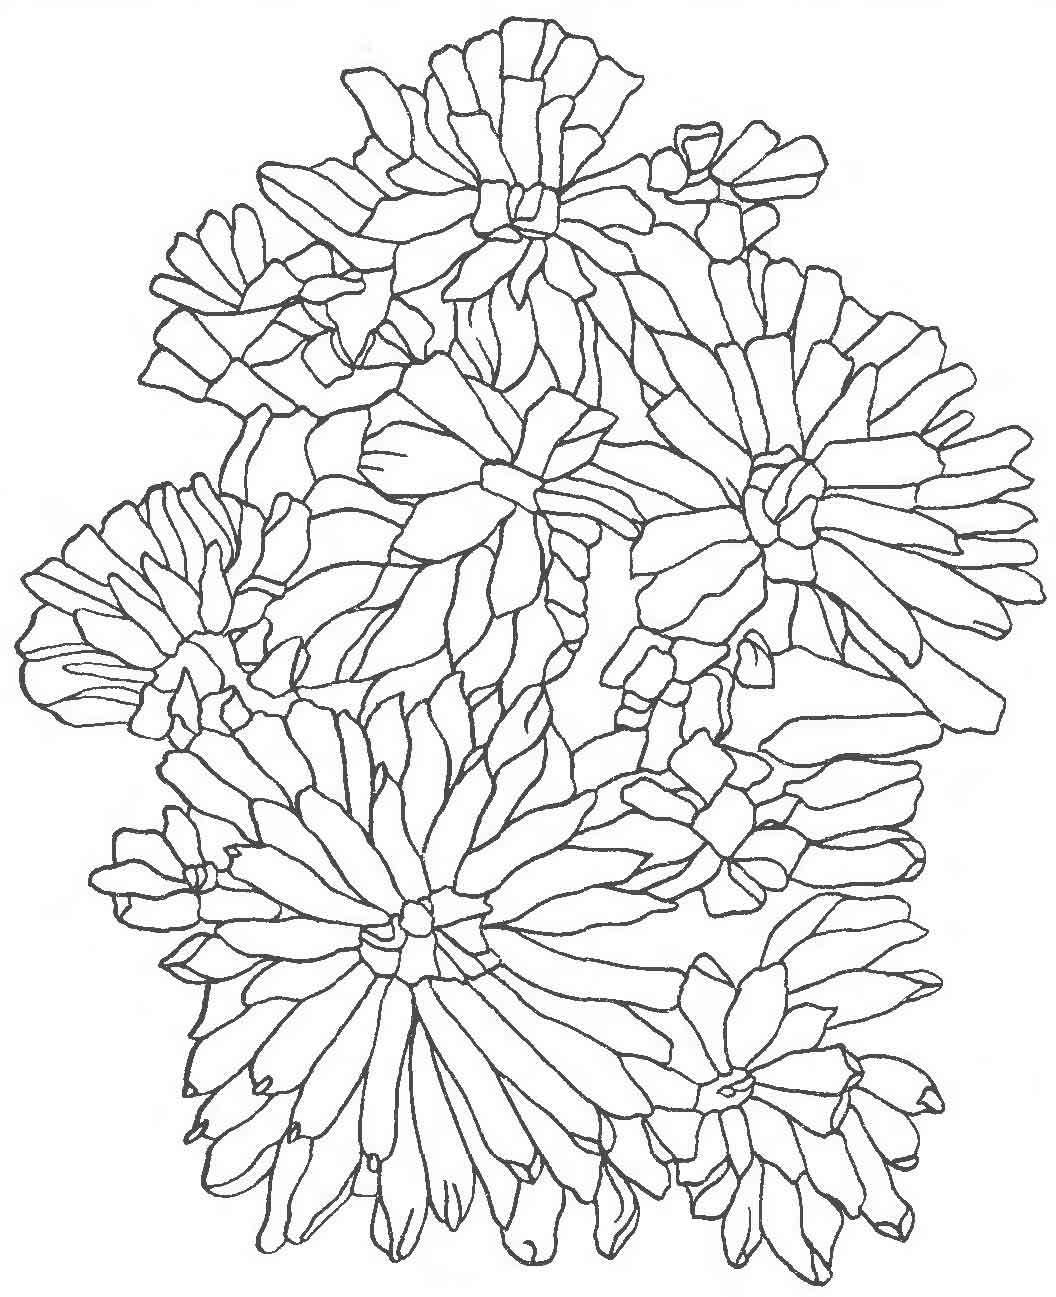 Шаблоны картин для вышивки лентами